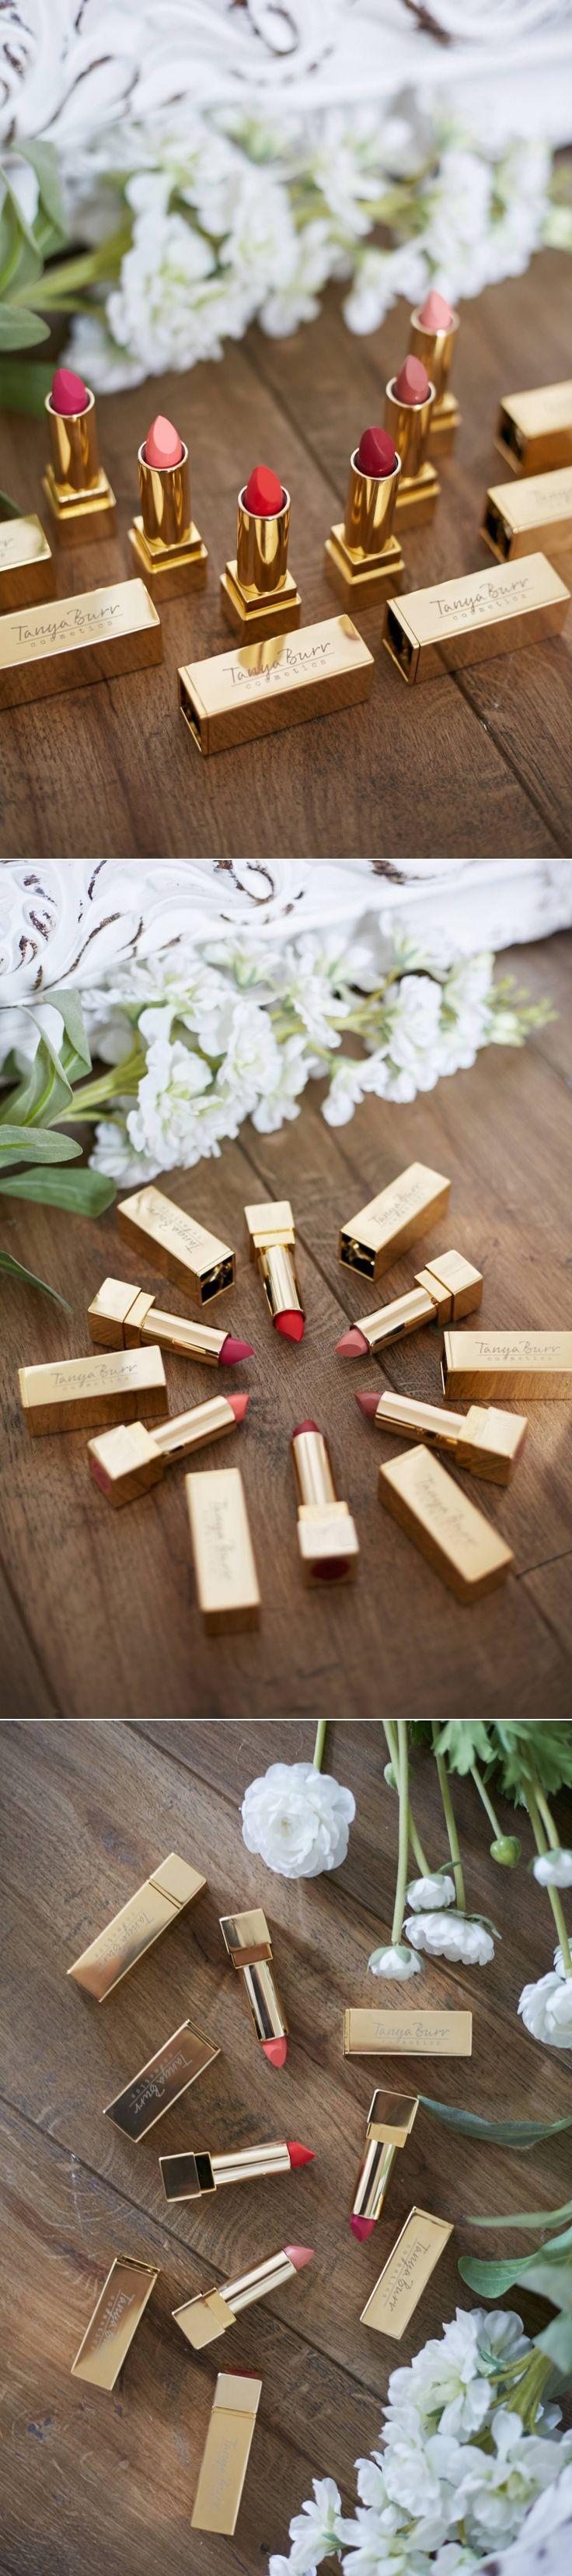 Cosmetic Product Photography | Tanya Burr Cosmetics Lipsticks - Tanya Burr